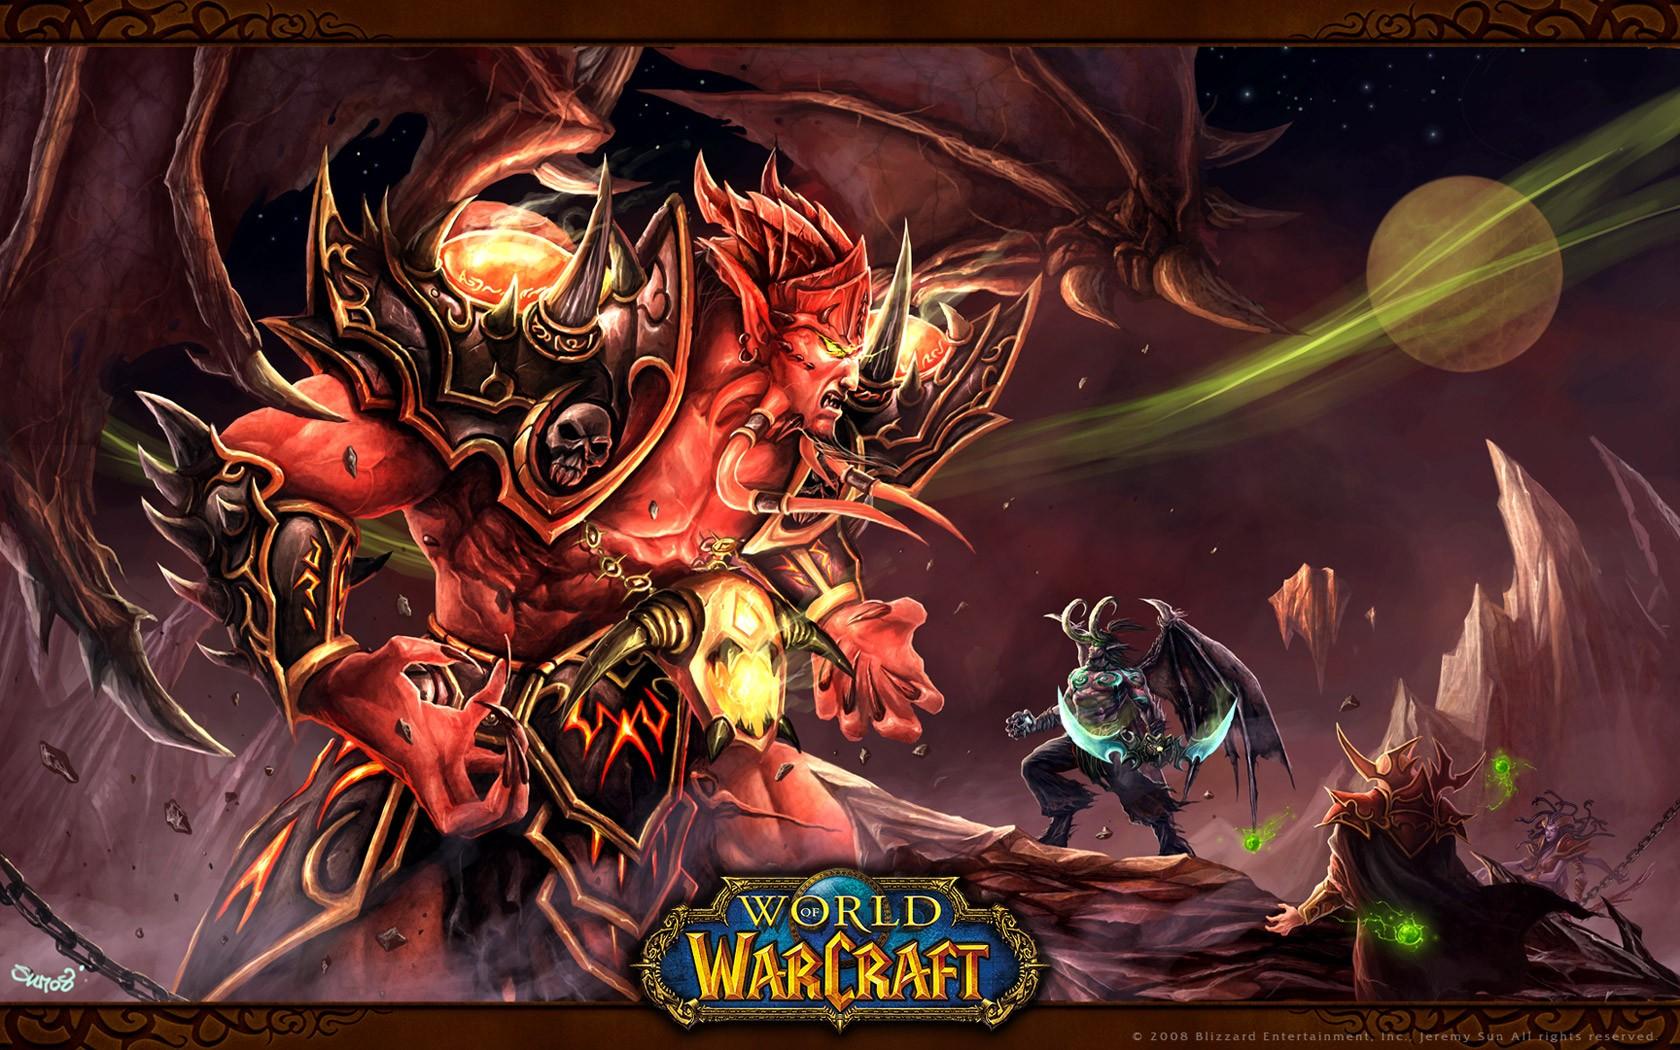 World of Warcraft nigh elf porn pics fucks video